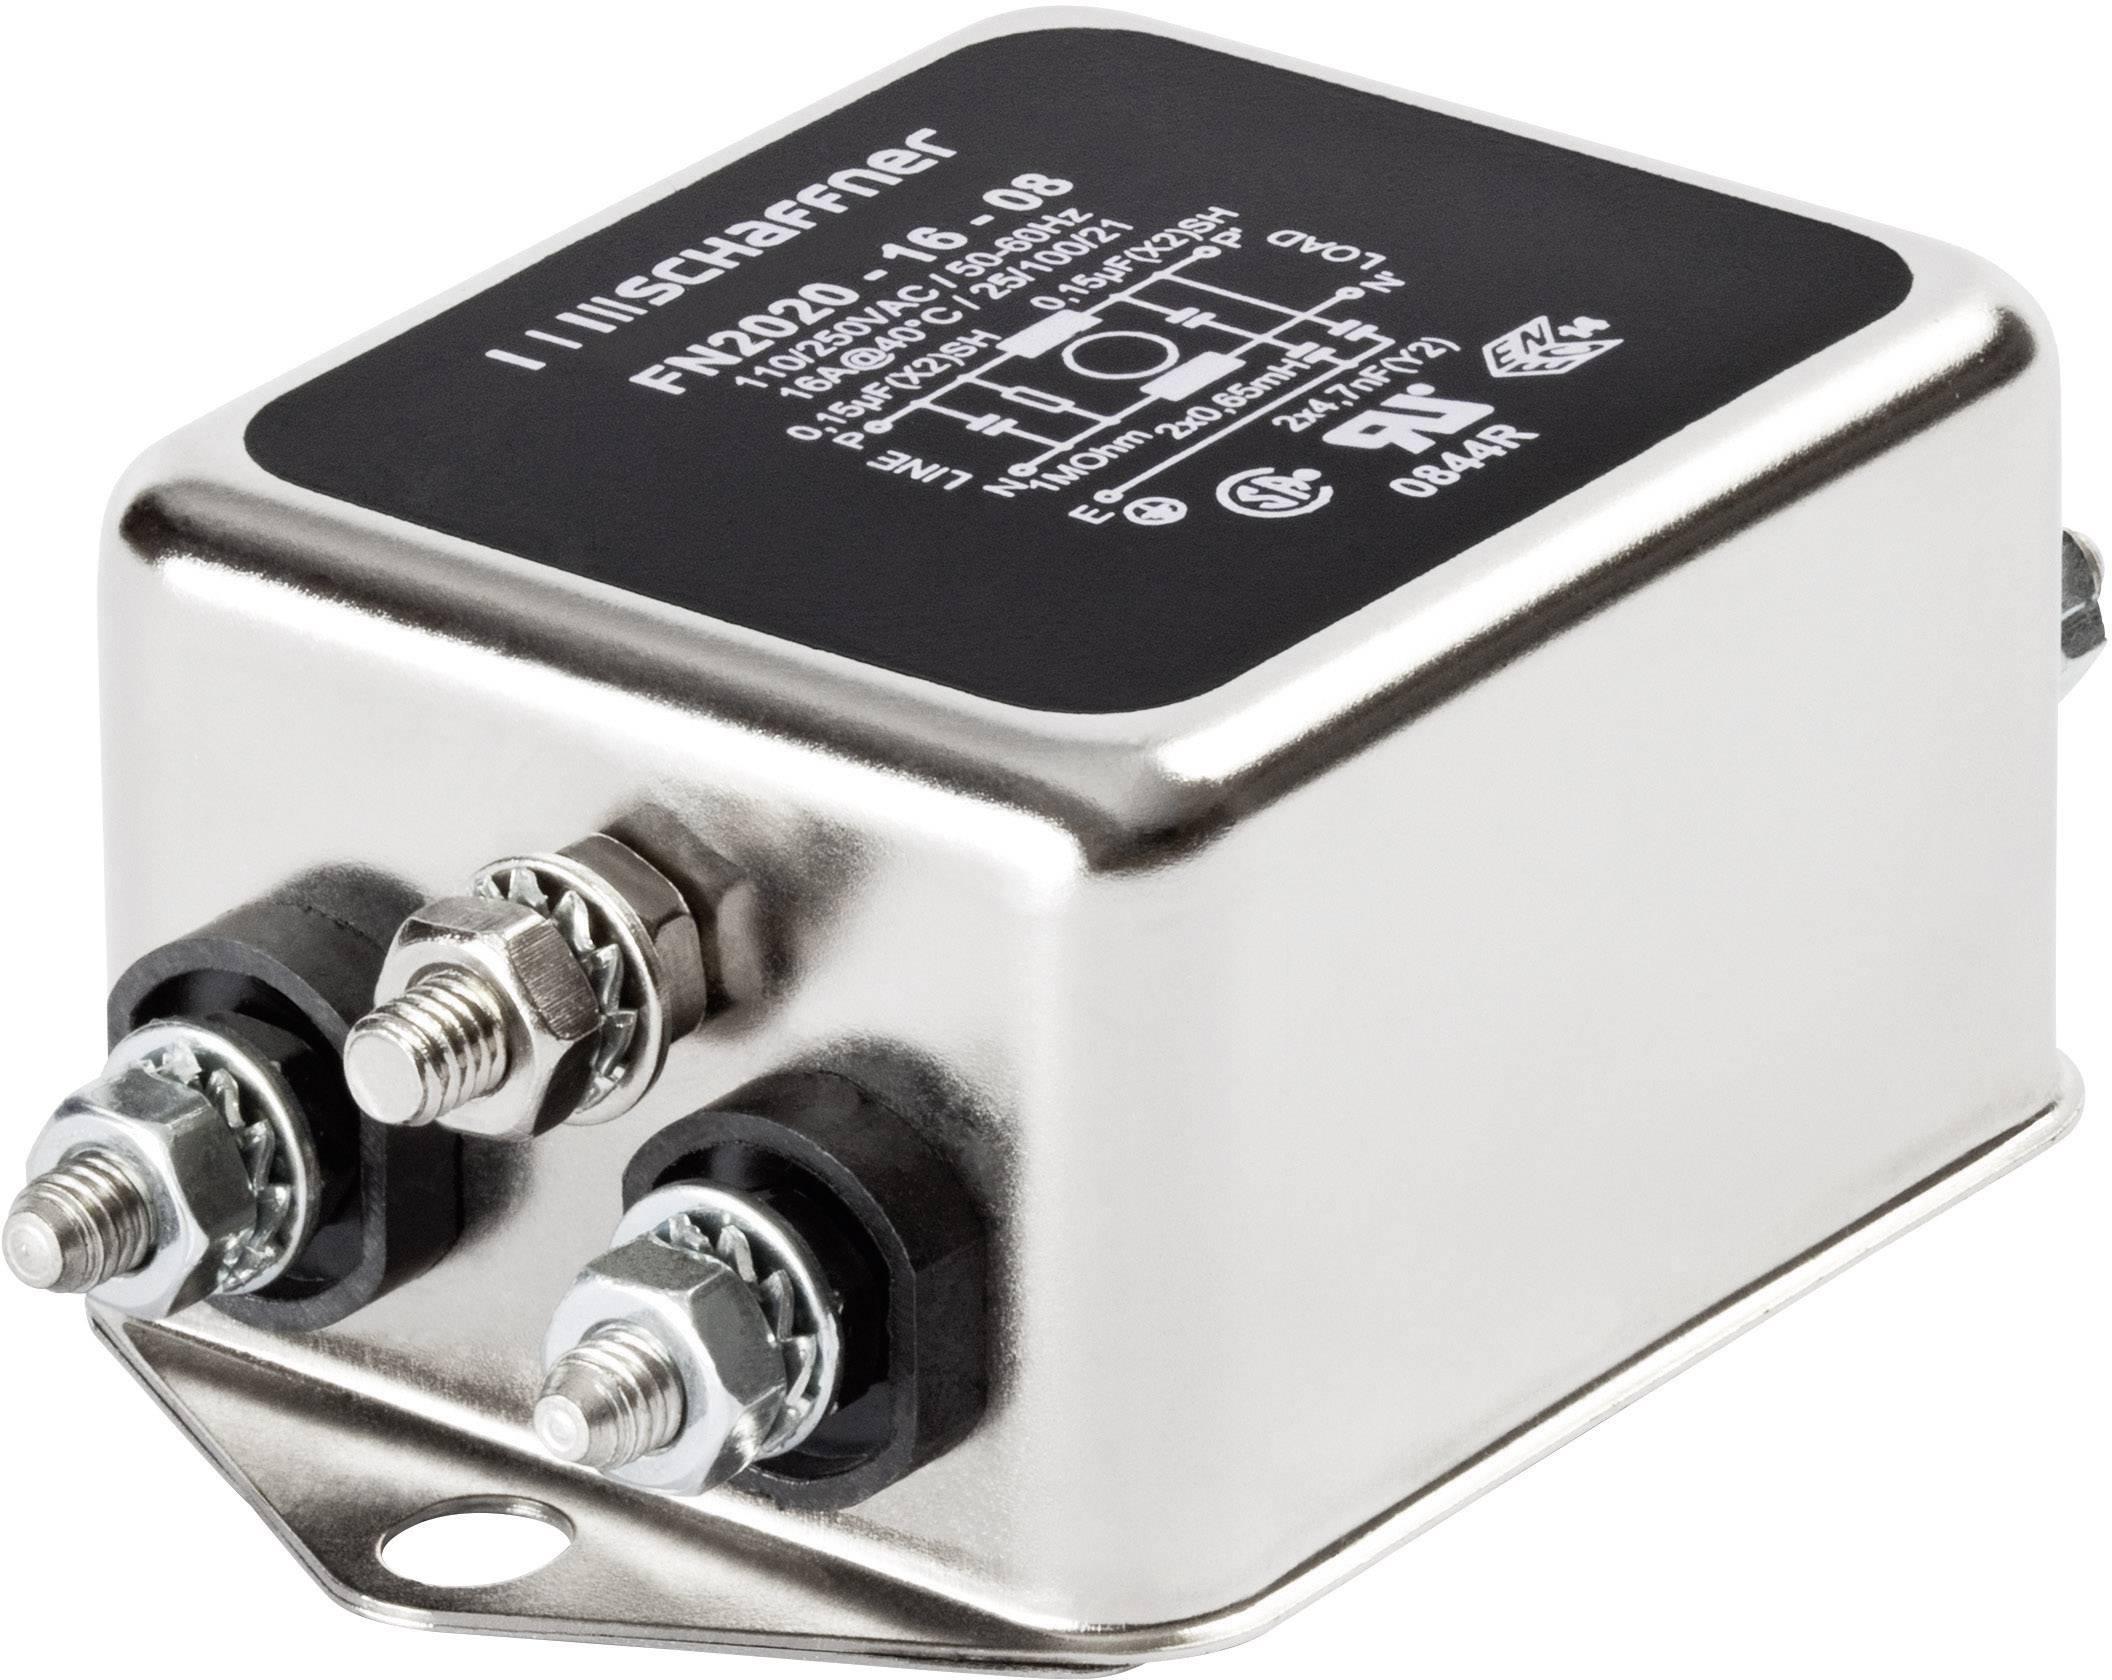 Síťový filtr Schaffner, FN 2020-16-06, 0.65 mH, 250 V/AC, 16 A